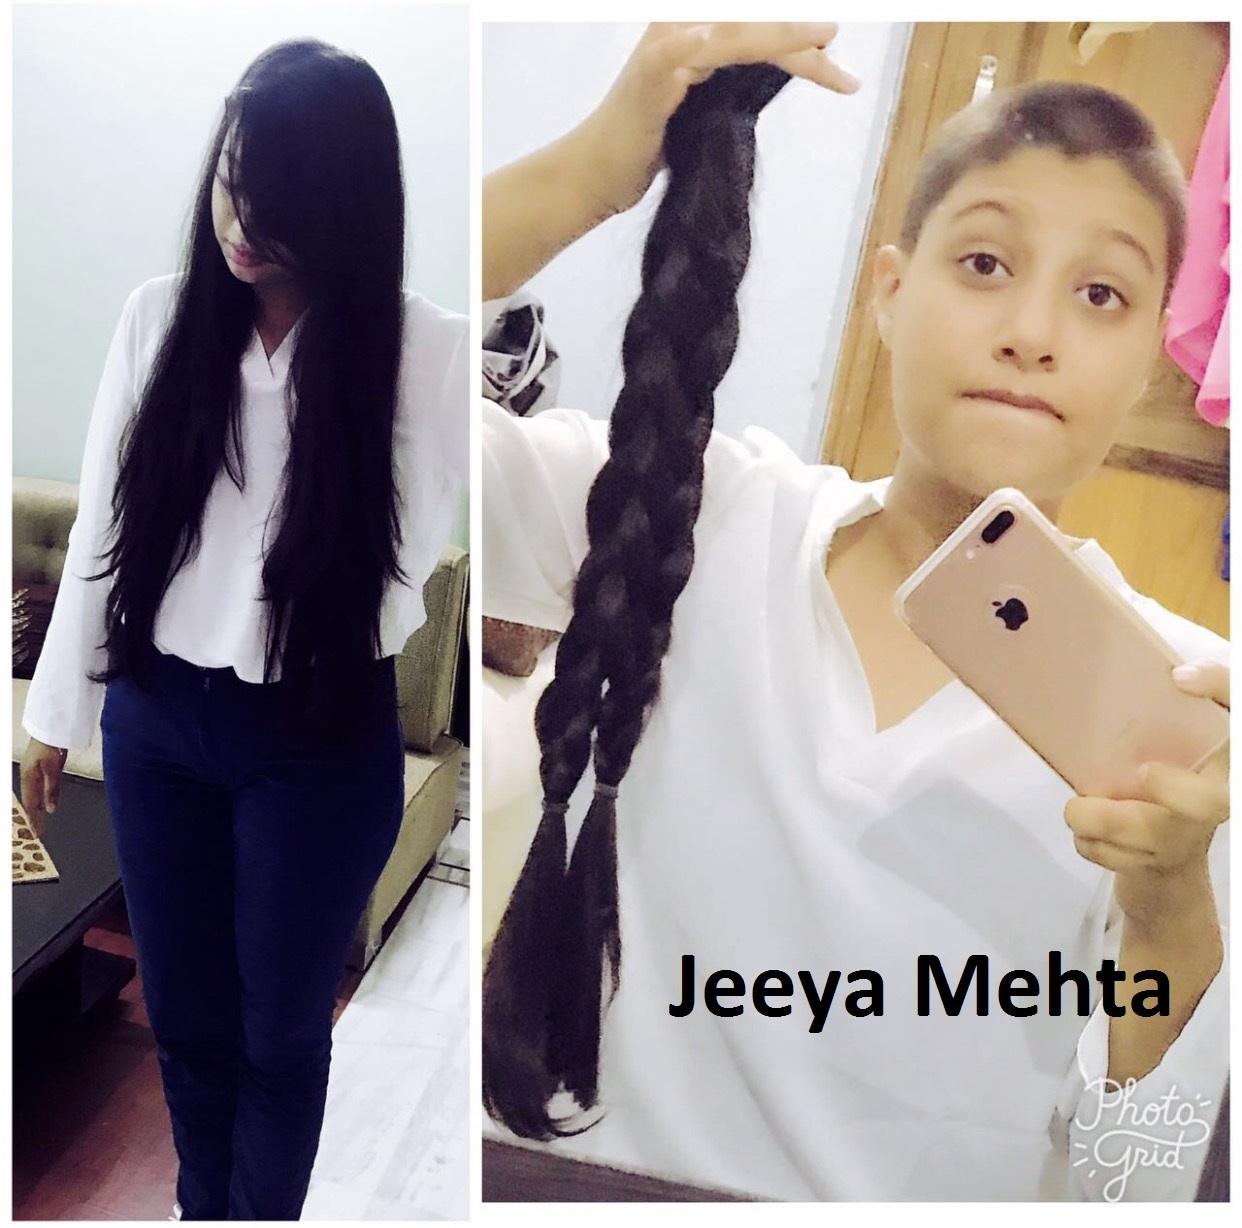 Jeeya Mehta